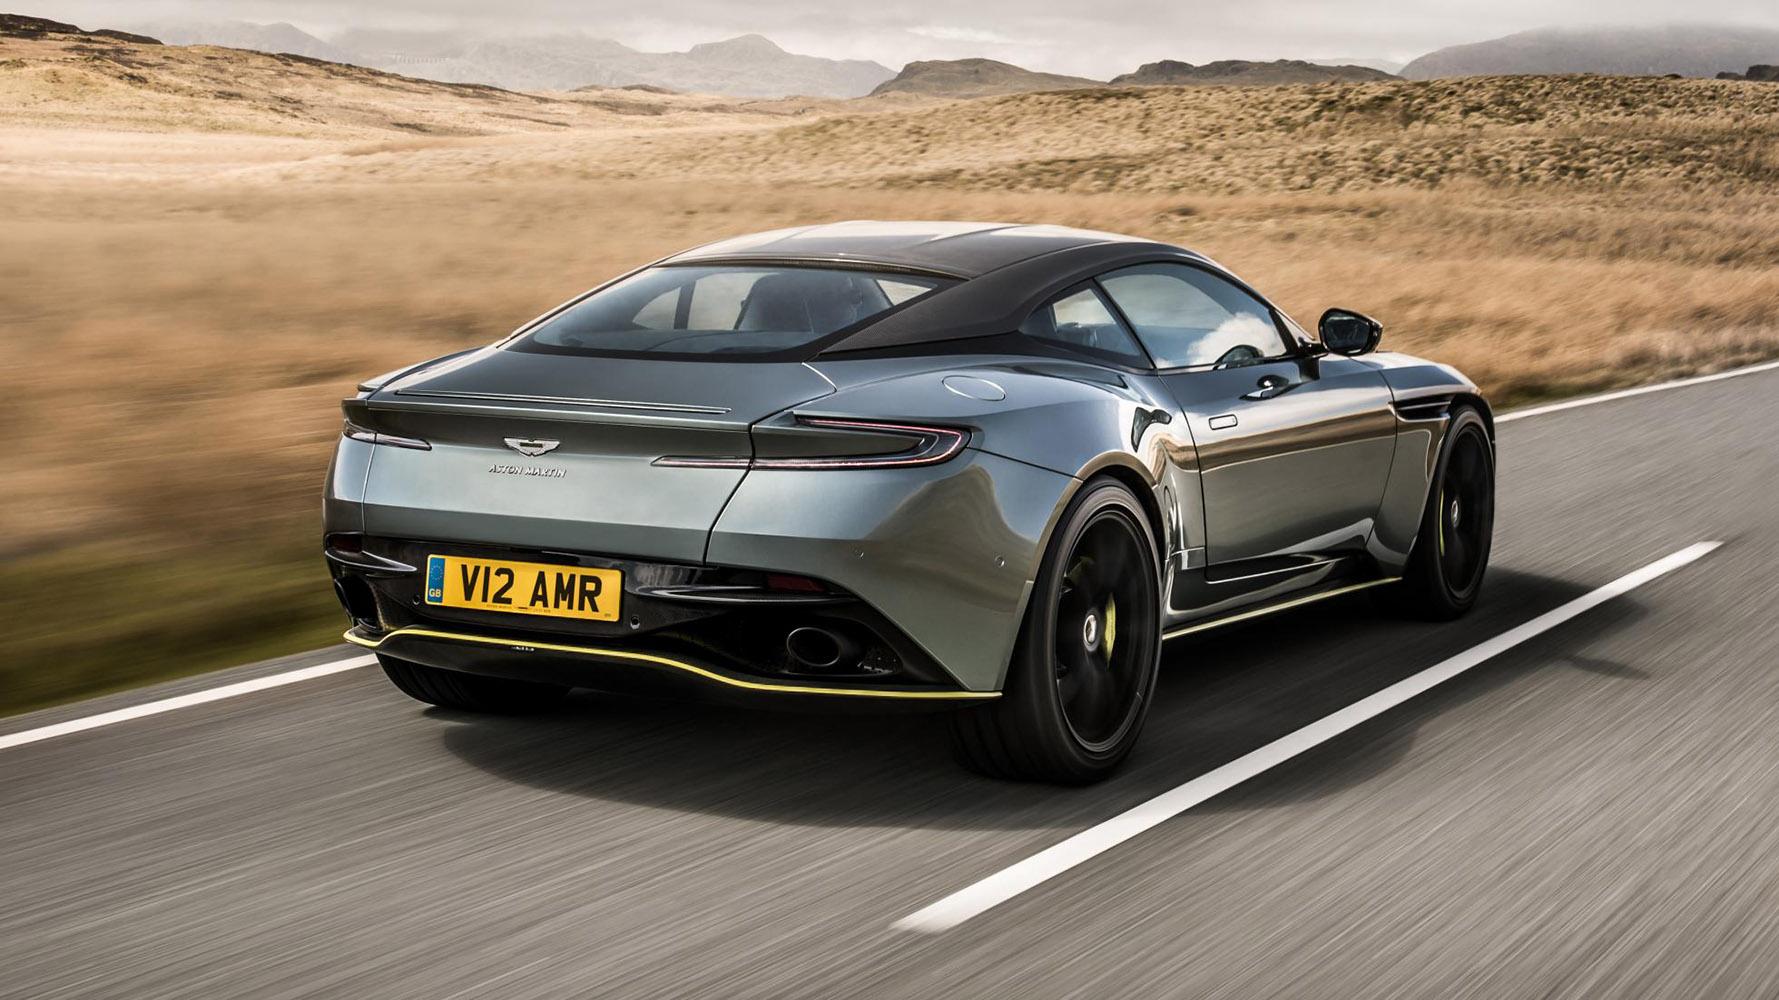 2019 Aston Martin DB11 AMR (2)